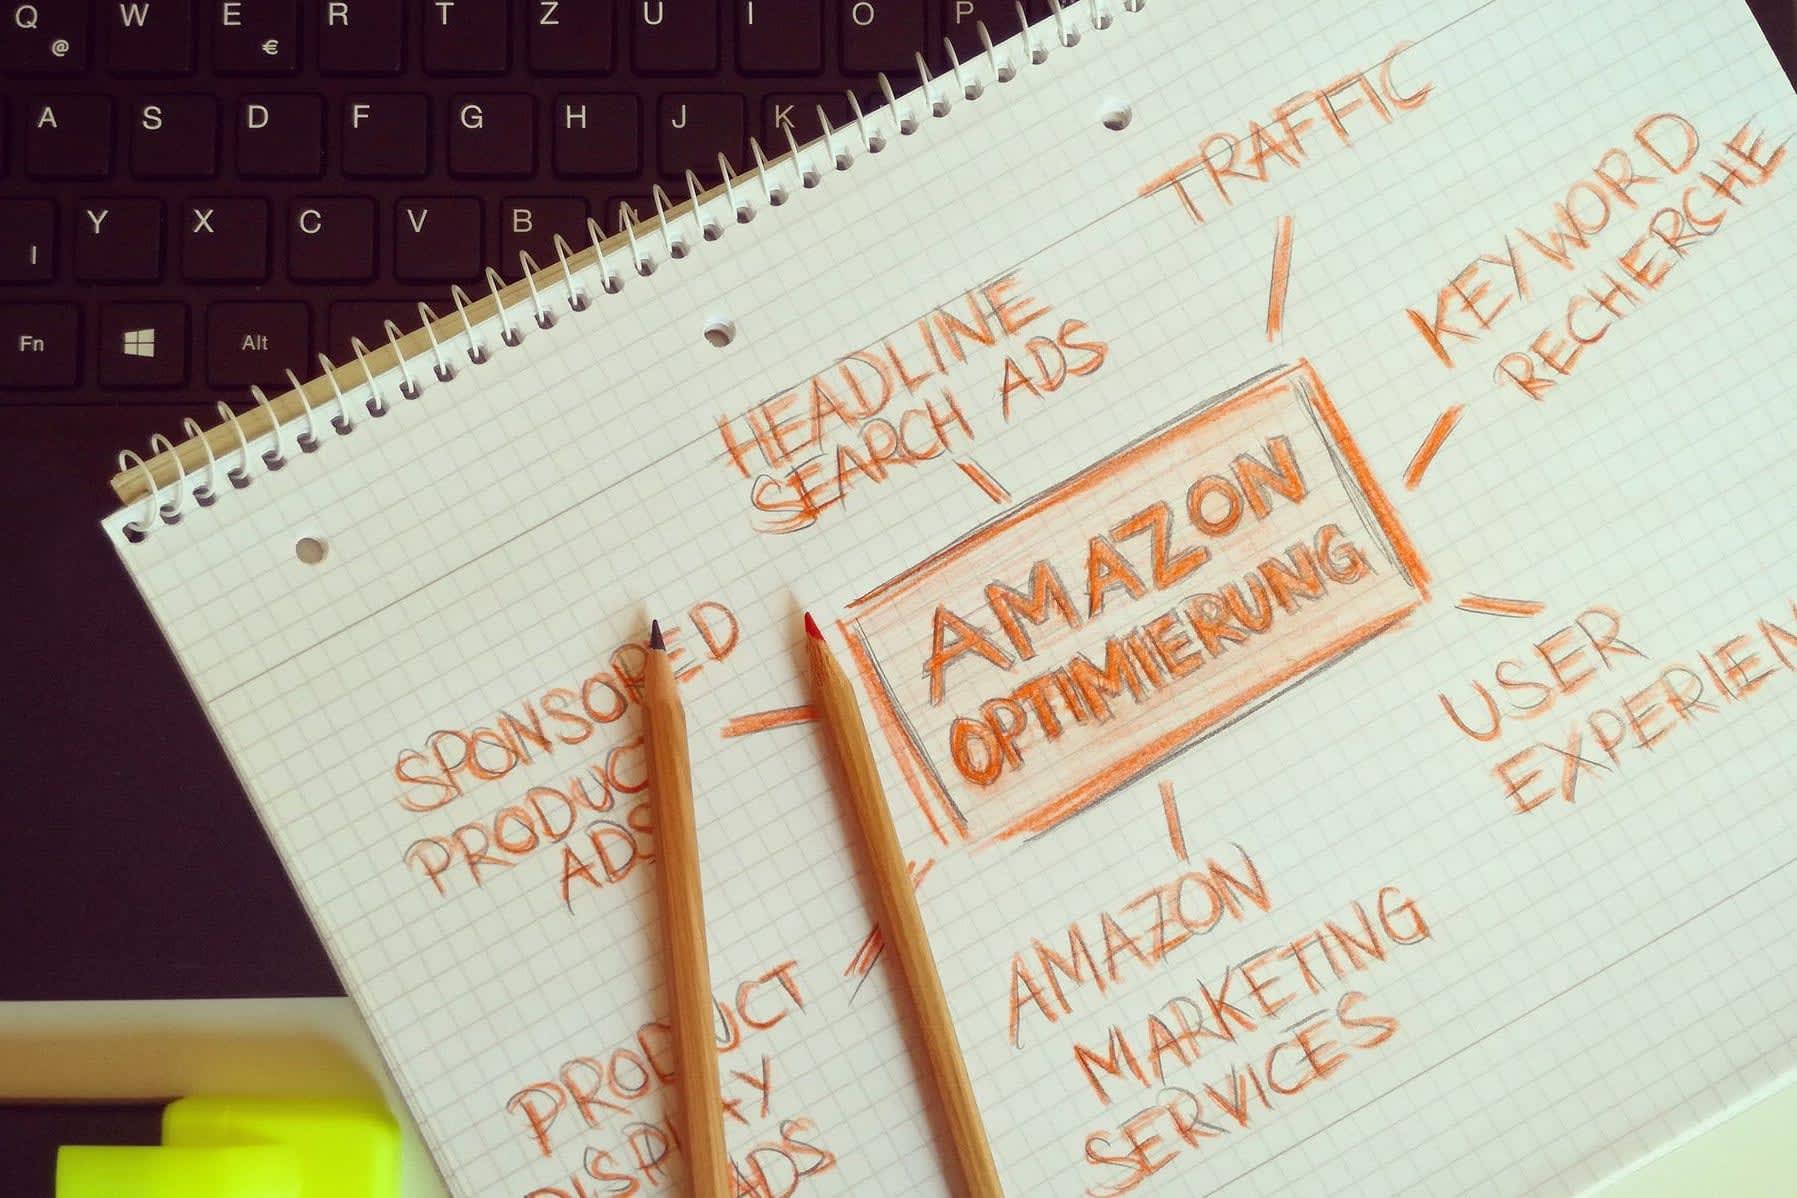 Portfolio for Merch by Amazon Keyword Research